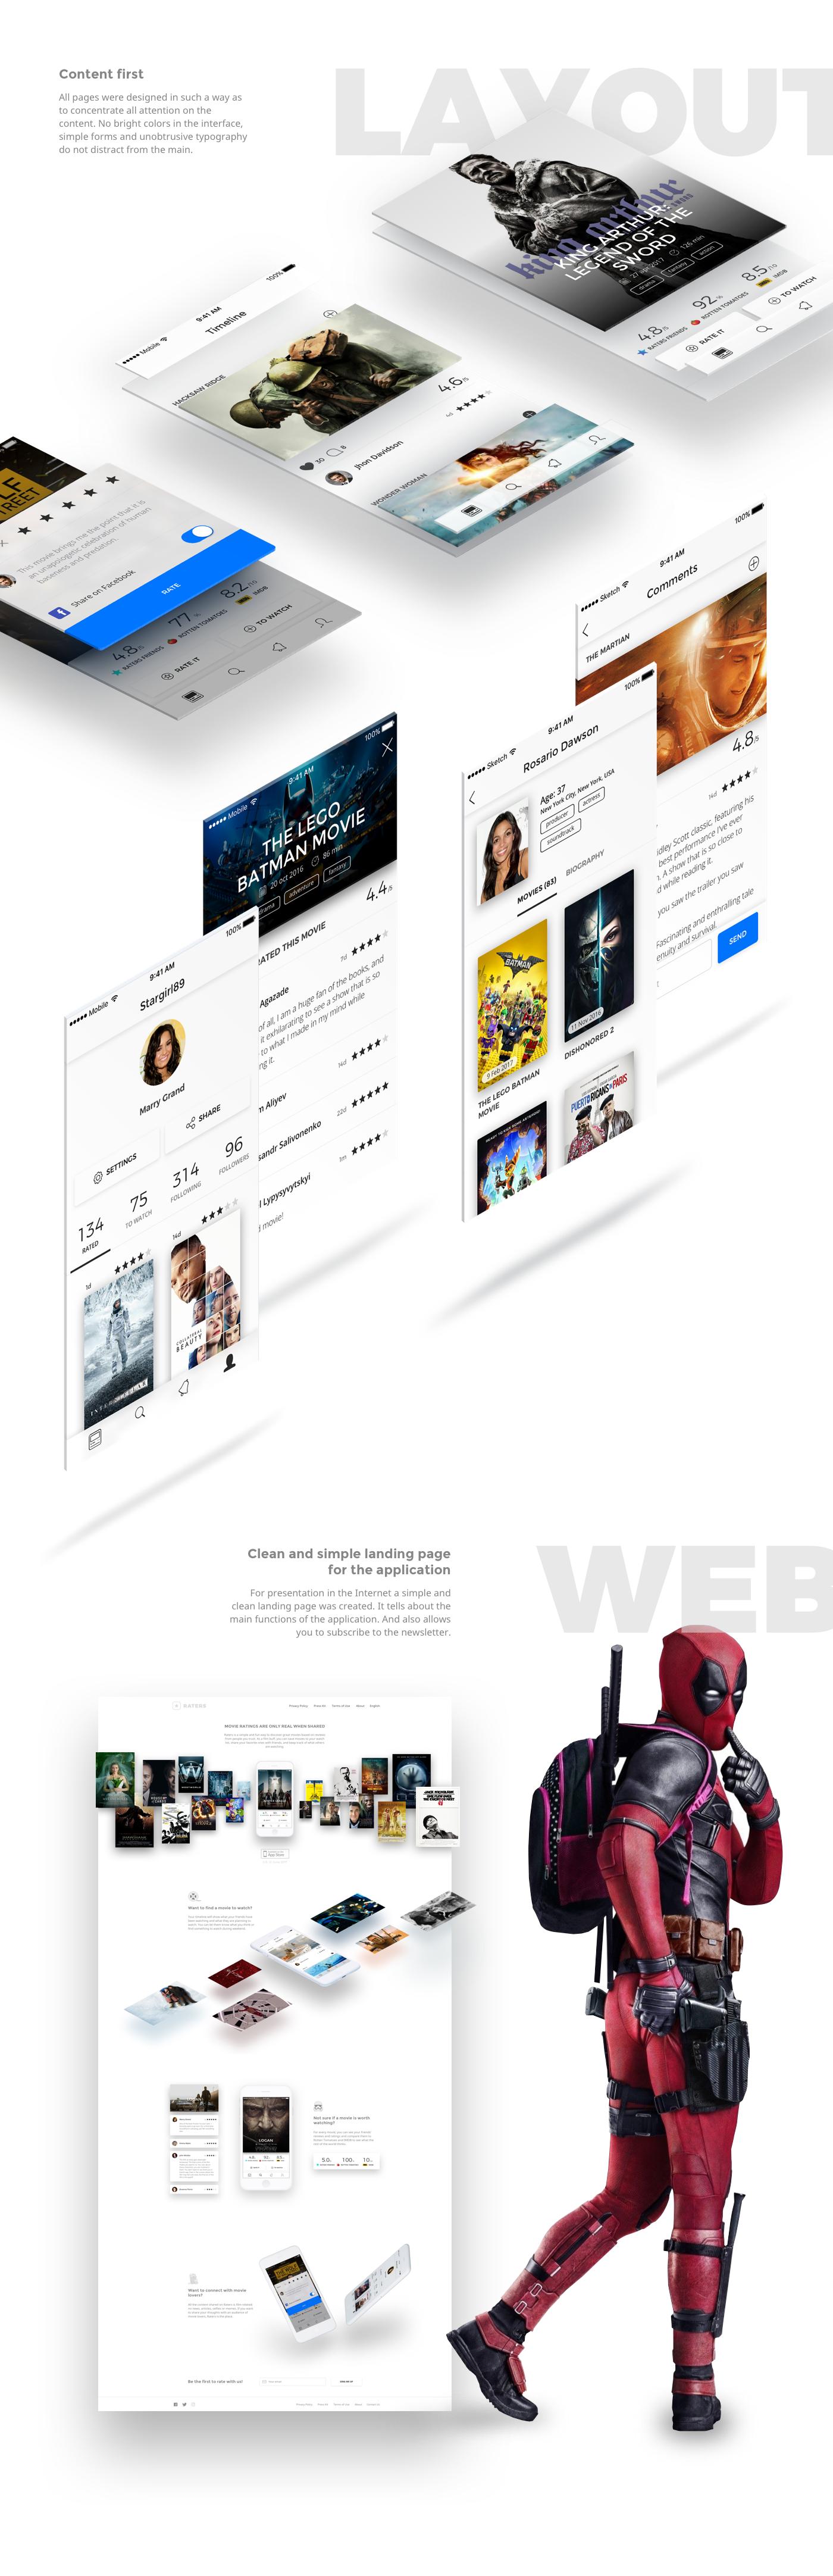 app mobile Web ios movie socialnetwork networking uiux mobile app design application